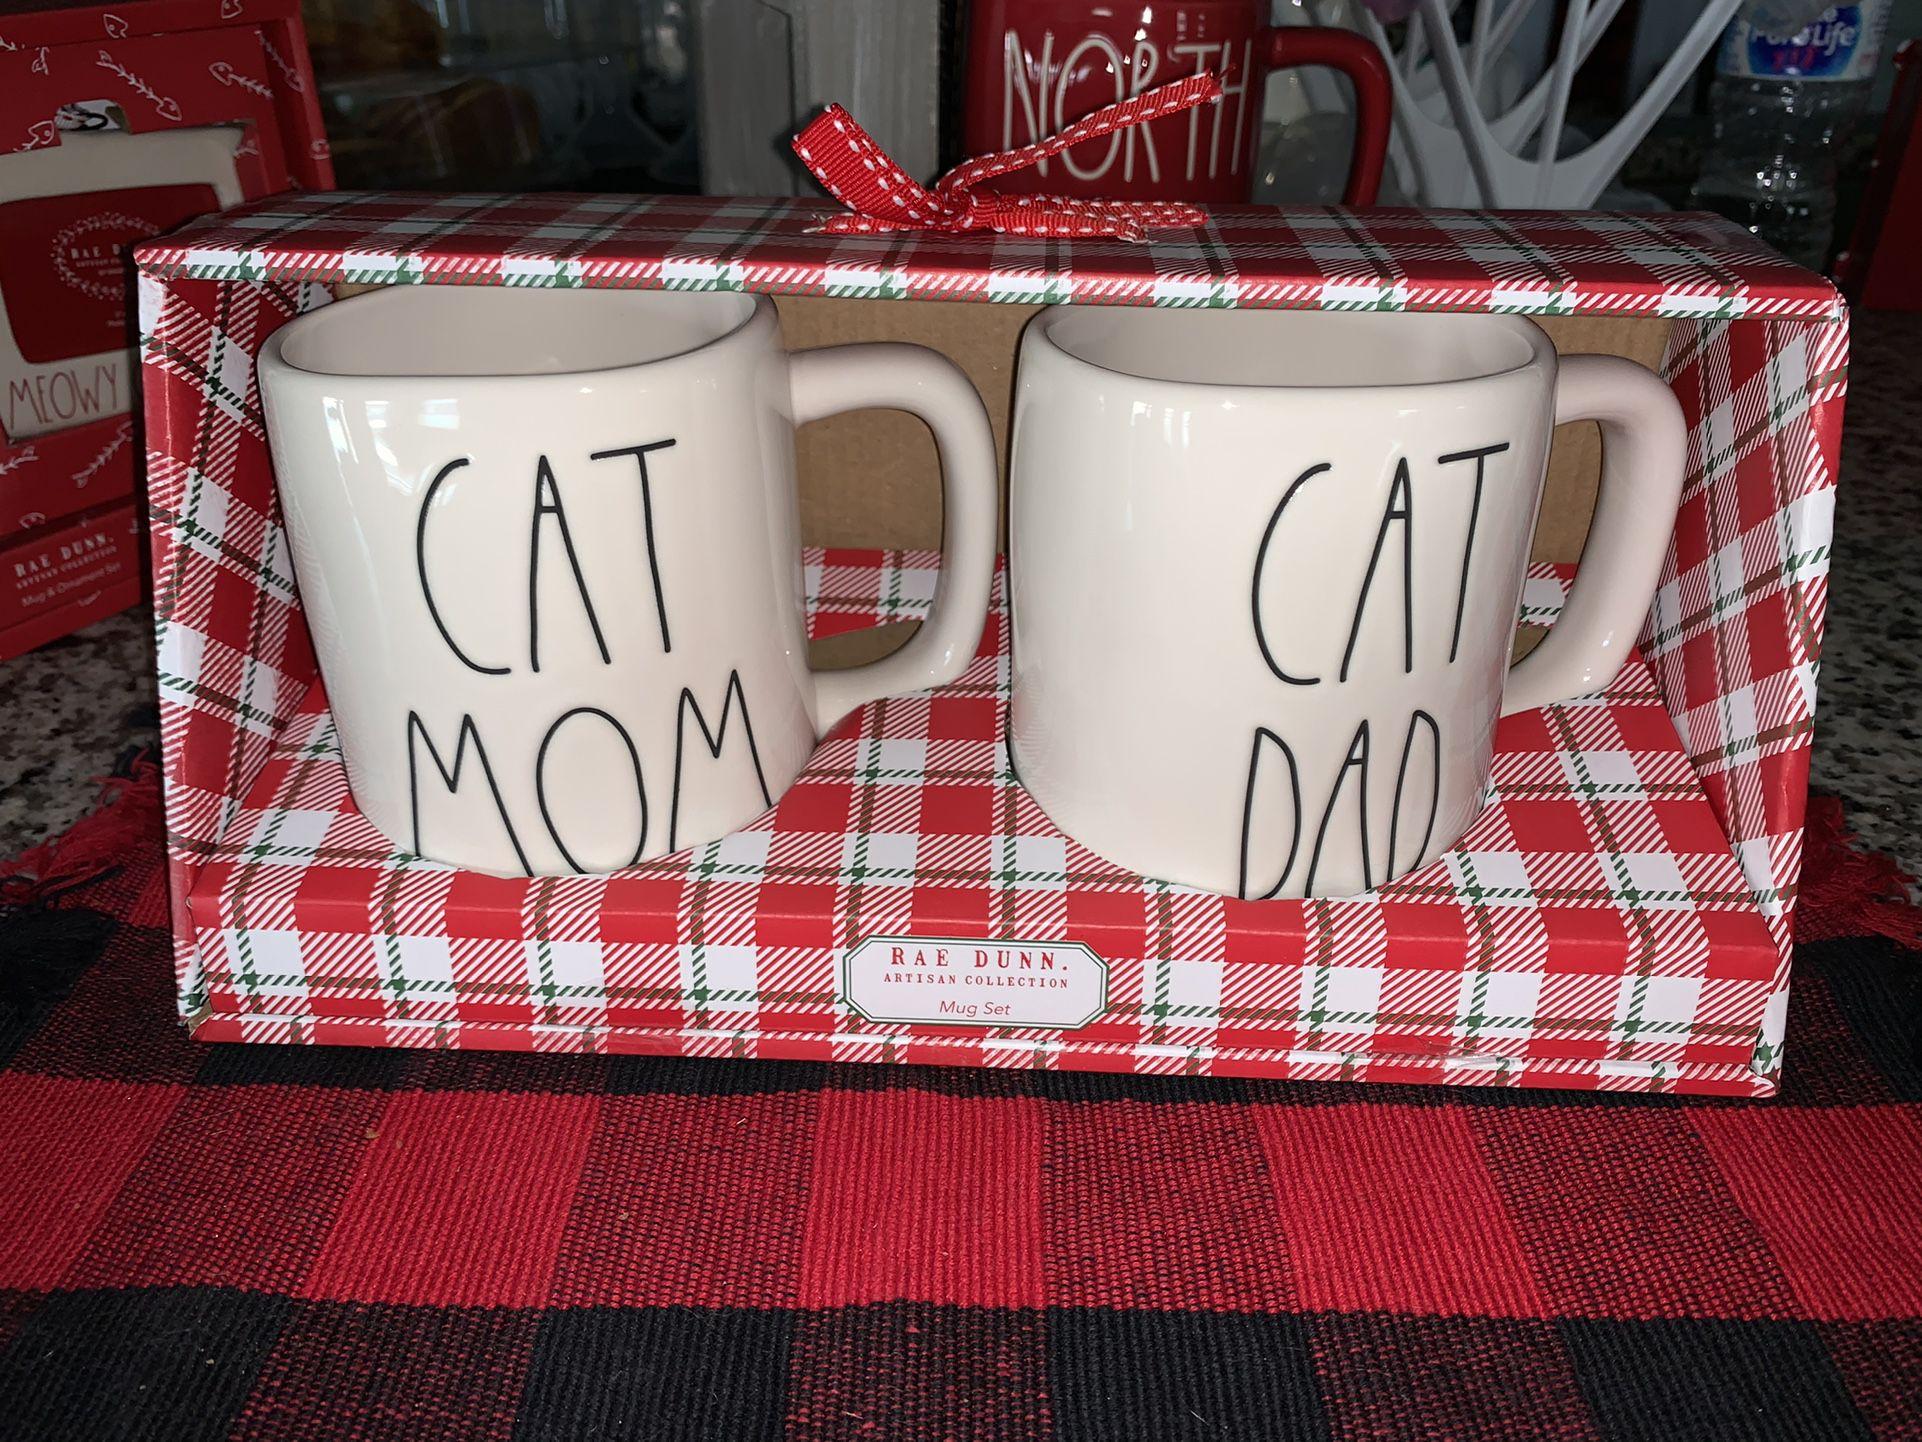 Rae Dunn CAT MOM & CAT DAD MUG GIFT SET